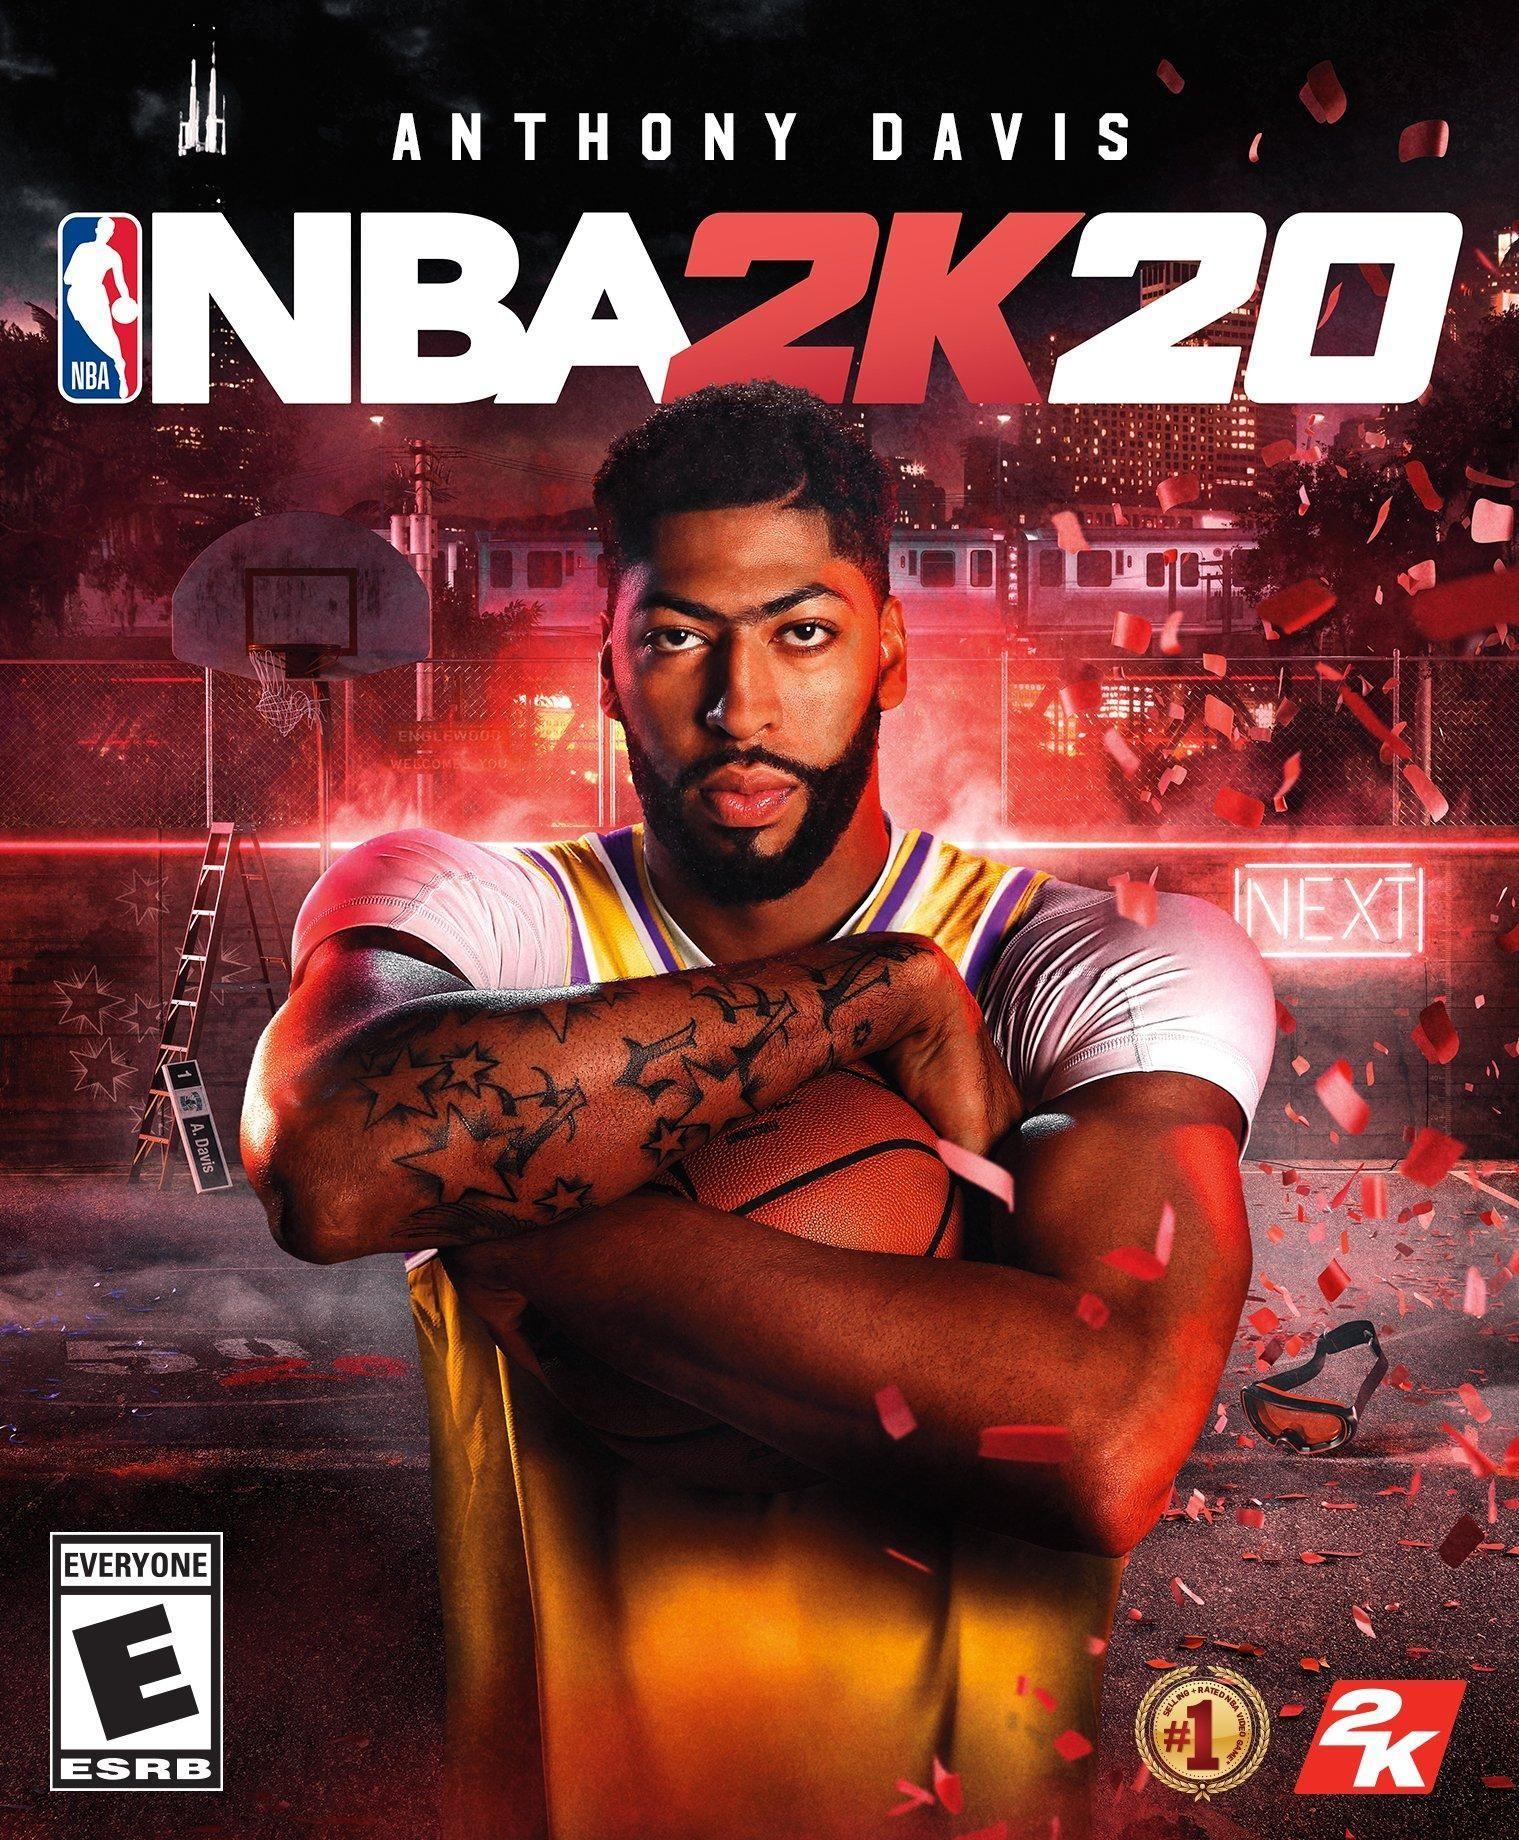 2k20 Cheat Codes Ps4 Free Nba 2k20 Apk Cheats For Nba 2k20 Nba 2k20 Ios Hack Nba 2k20 Obb File Download Cheat Codes Nba Ps4 Games Ios Games Xbox One Games